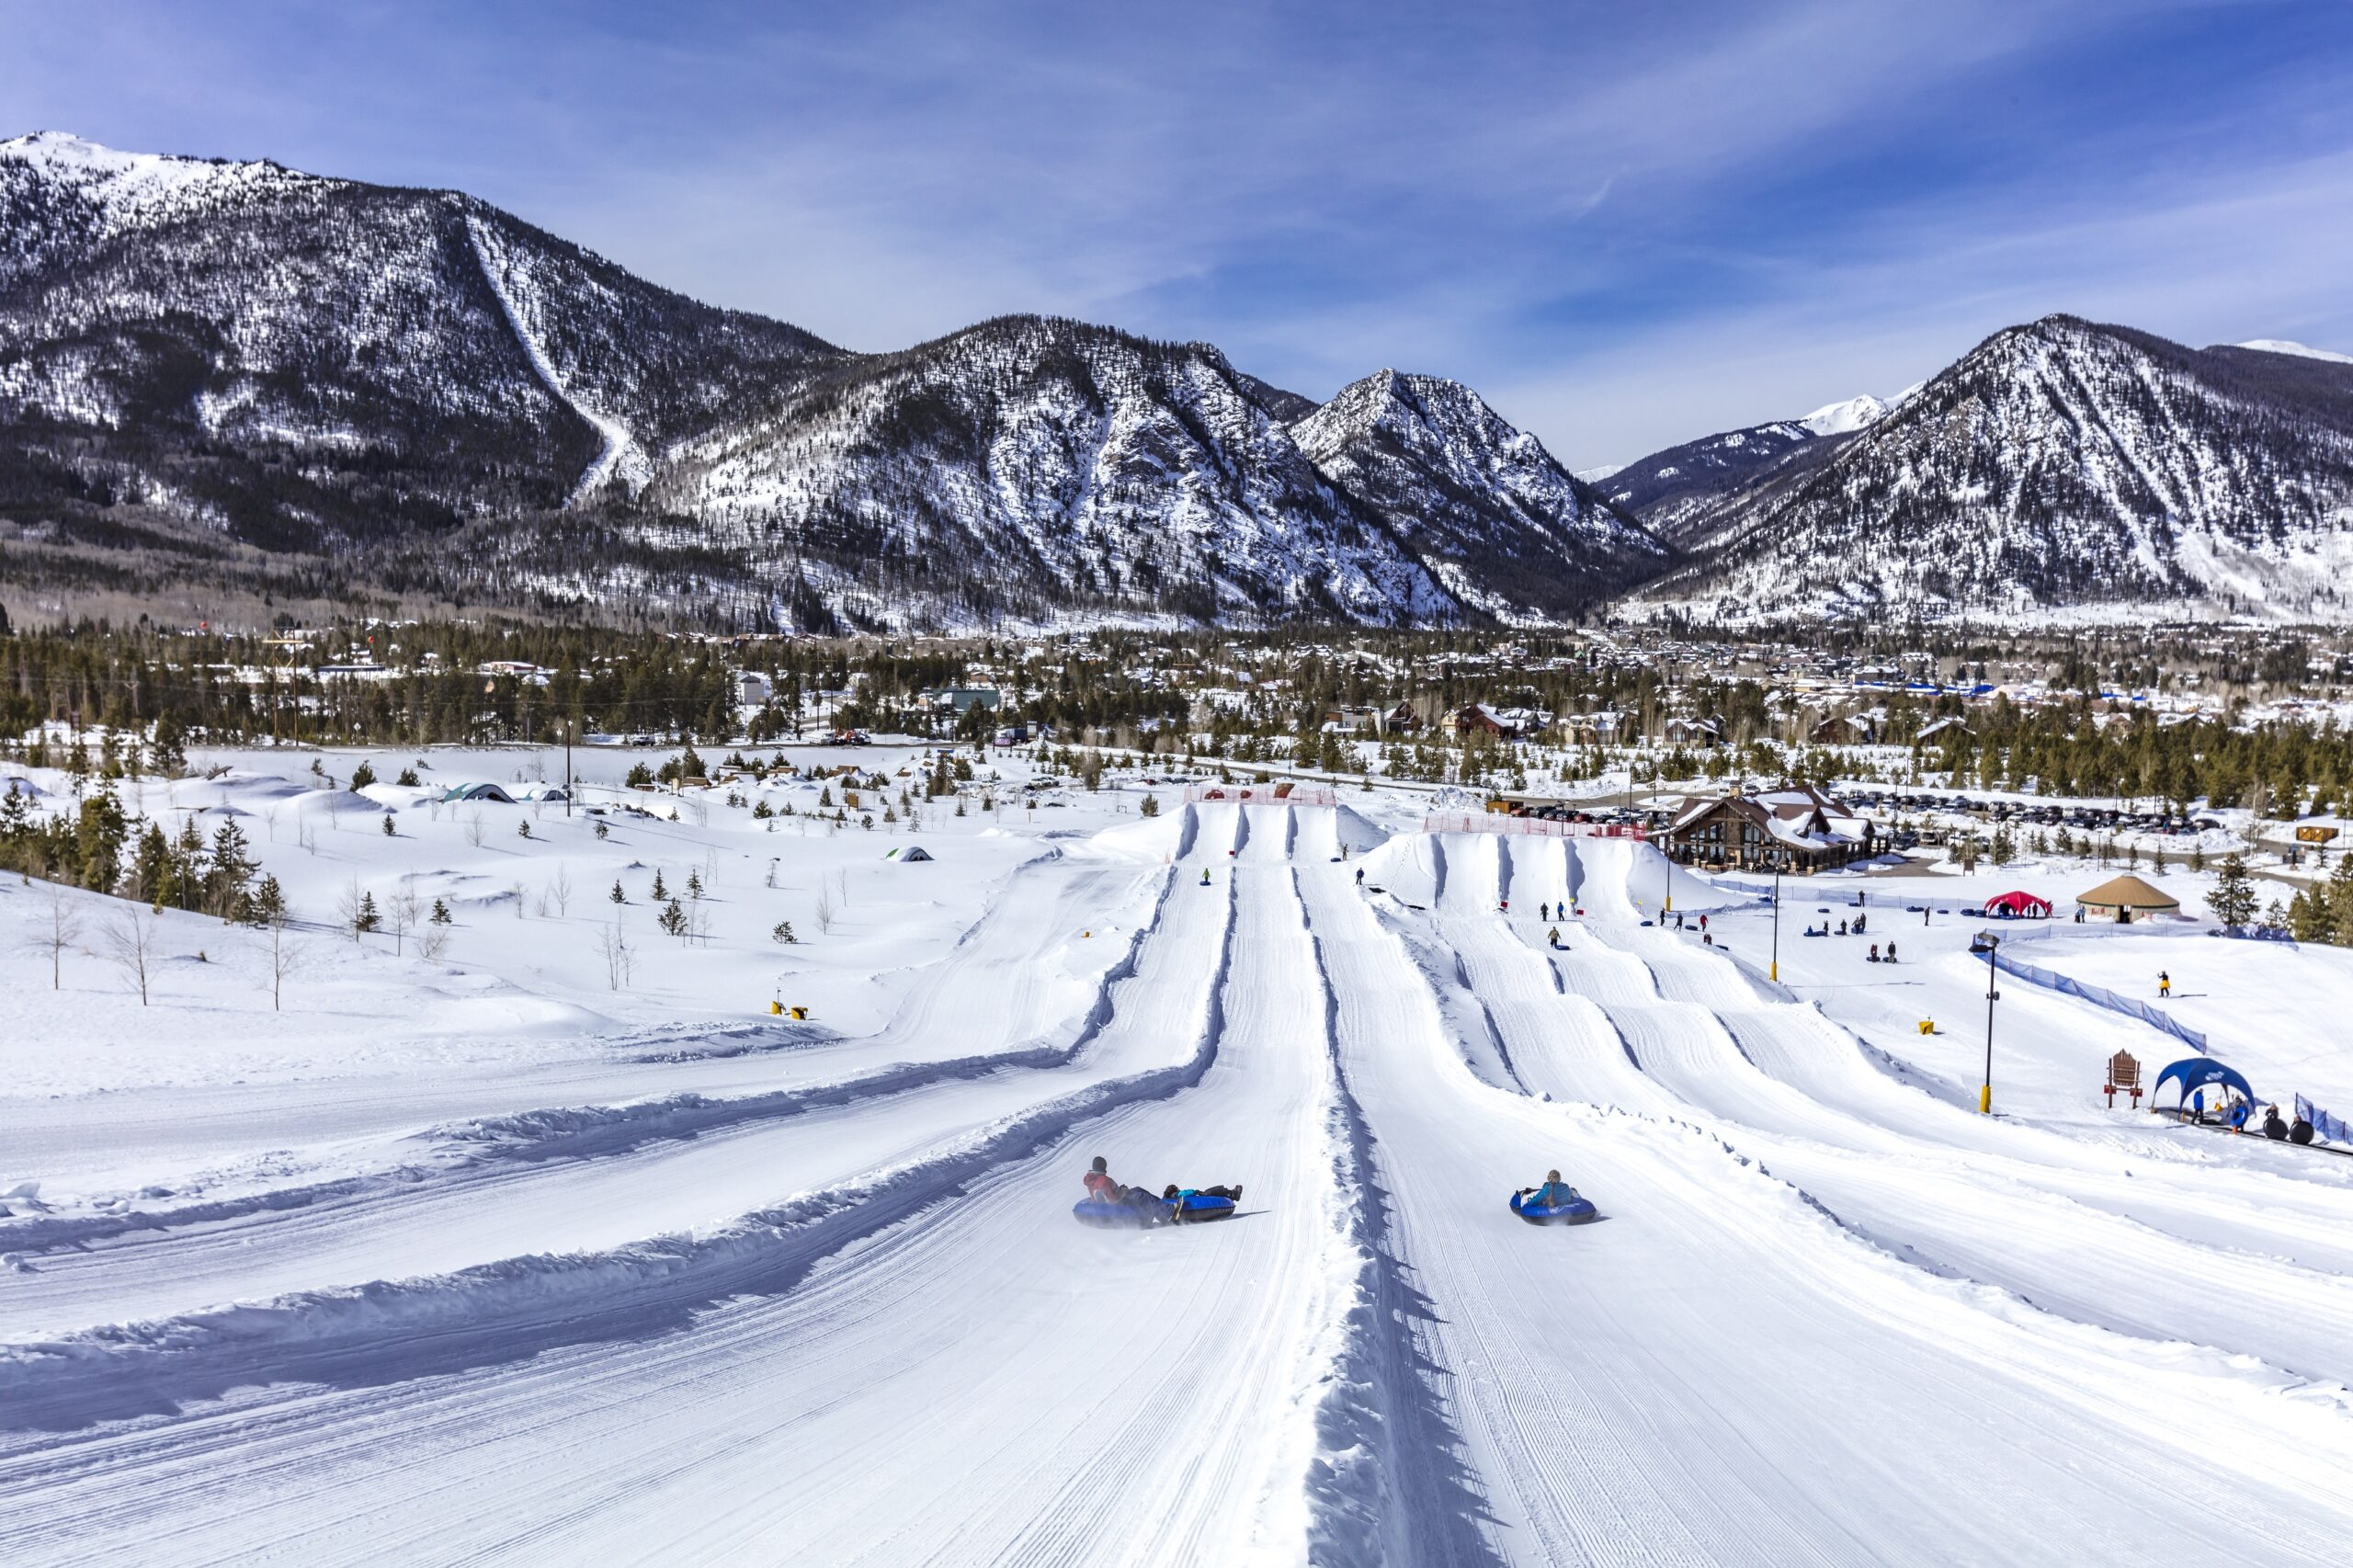 Snow Tubing Hill at the Frisco Adventure Park, Frisco, Colorado